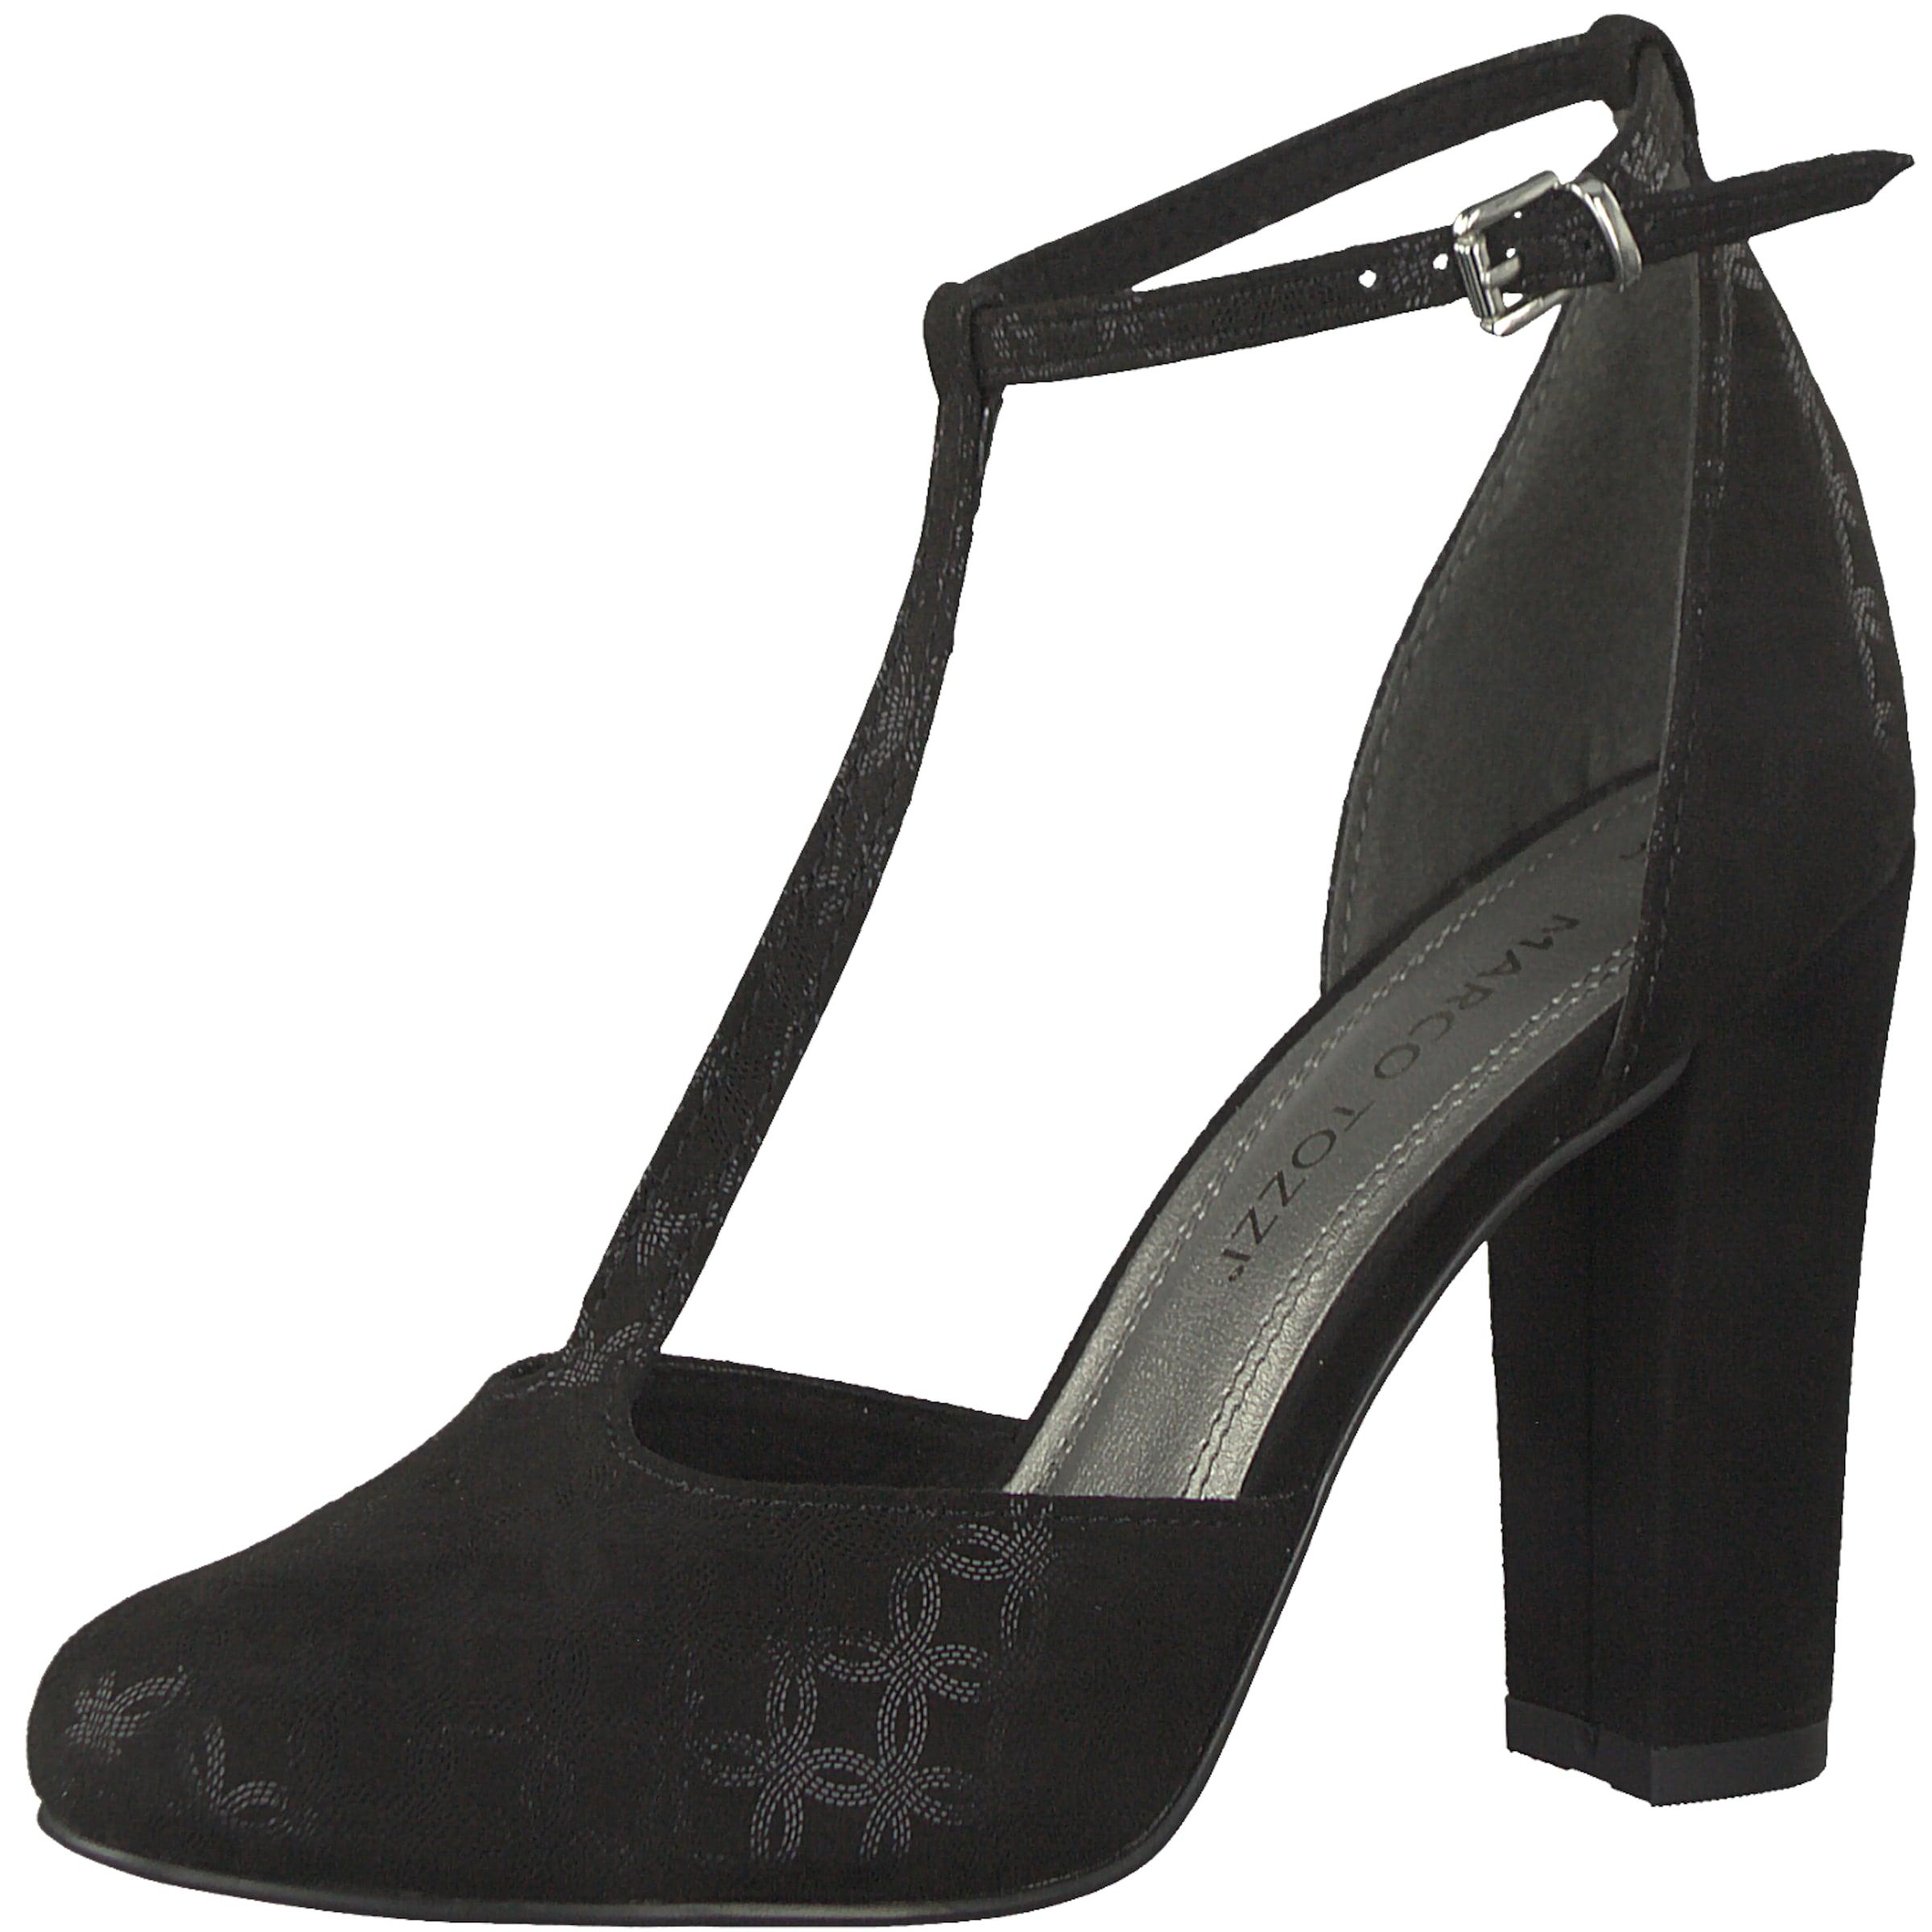 MARCO TOZZI Slingpumps Verschleißfeste billige Schuhe